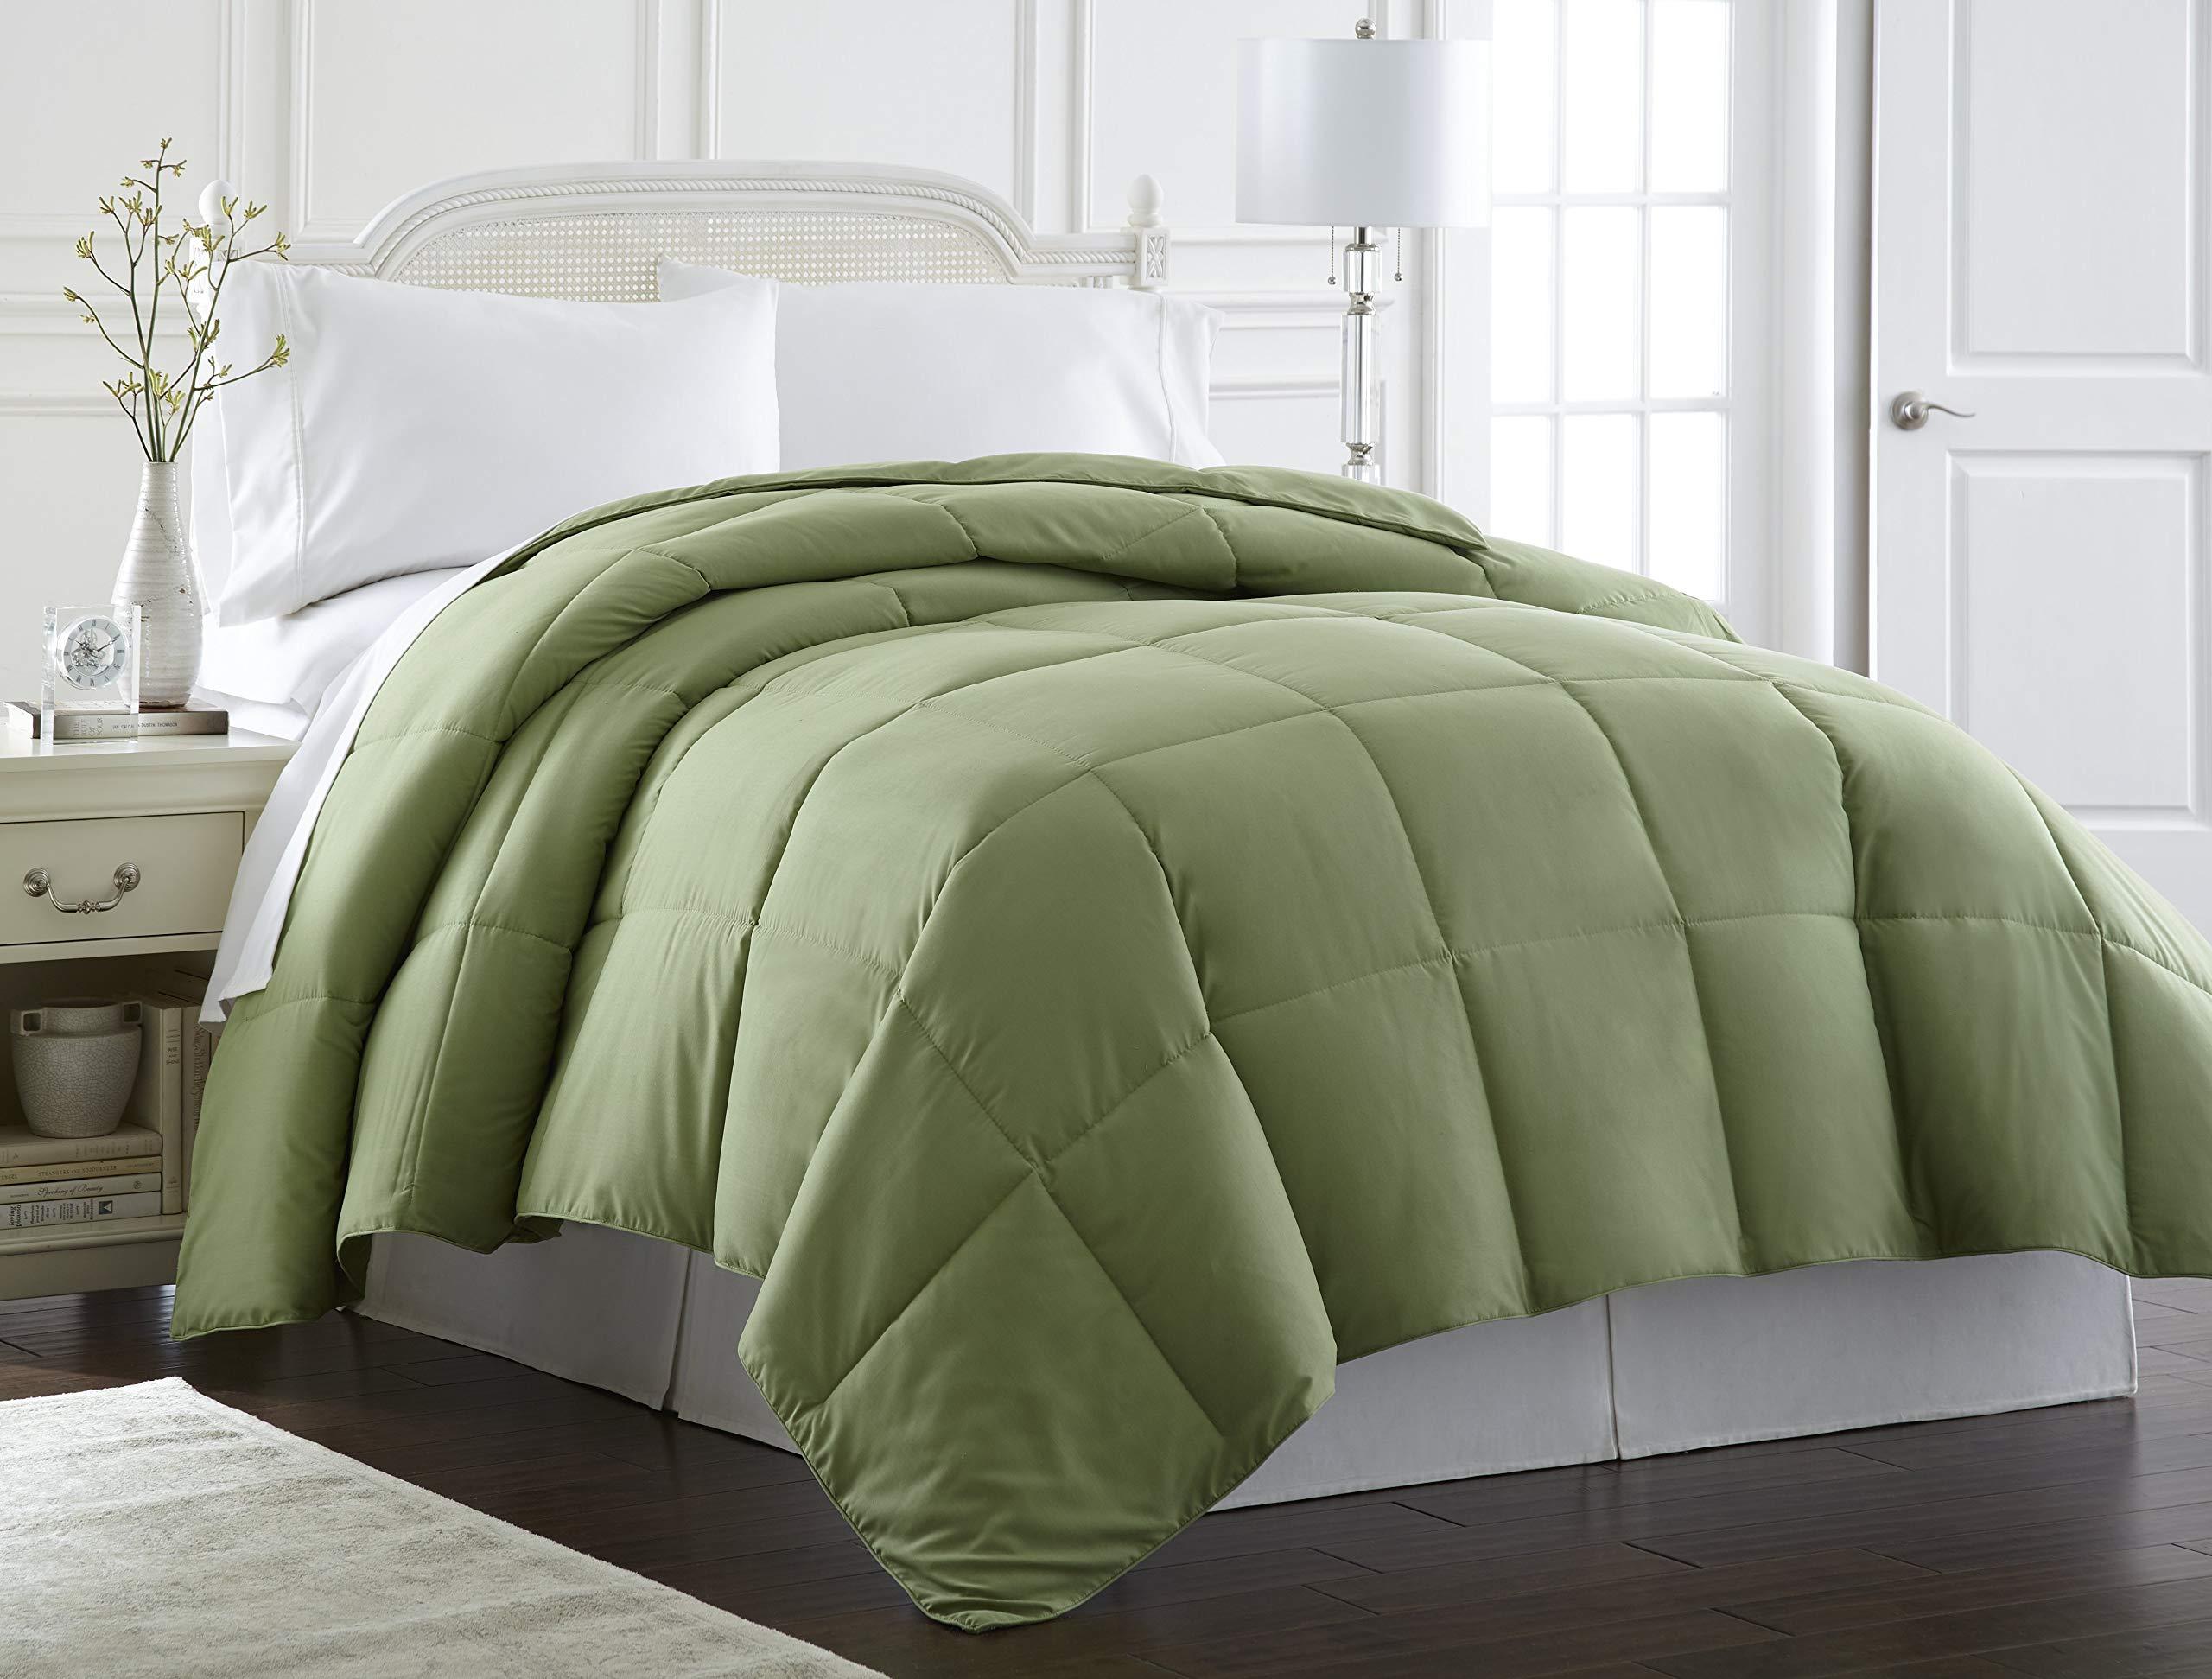 Spirit Linen Hotel 5Th Ave Milano Collection Luxurious Premier Quality Down Alternative Comforter, Full/Queen, Khaki by SPIRIT LINEN HOME